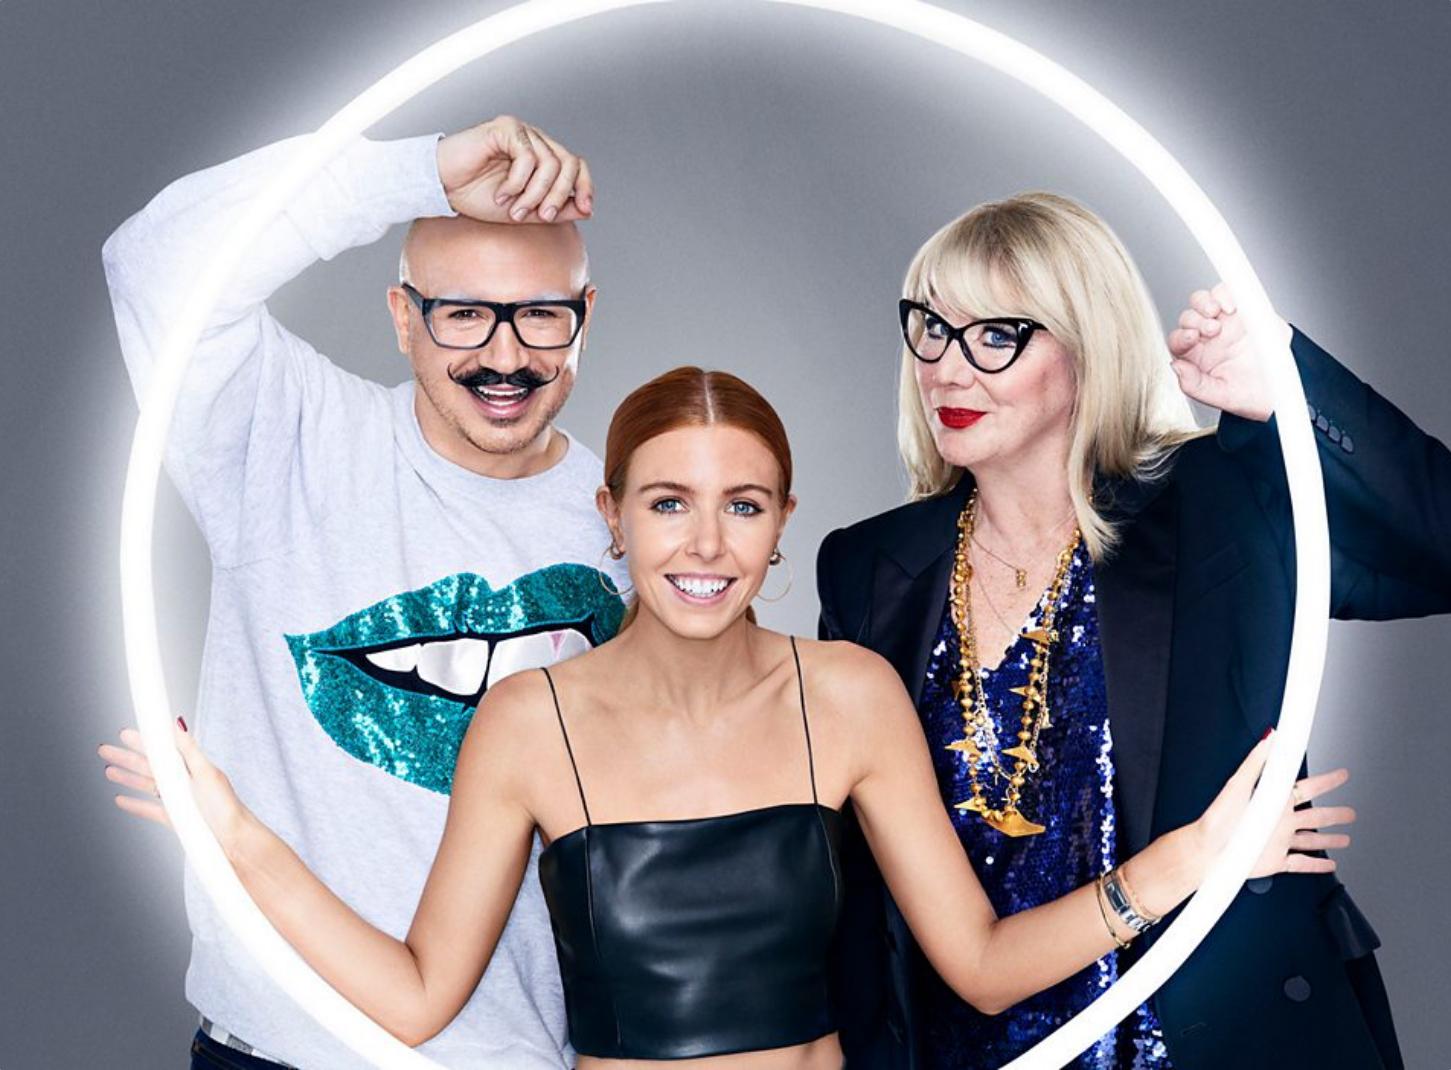 glow up bbc three presenters